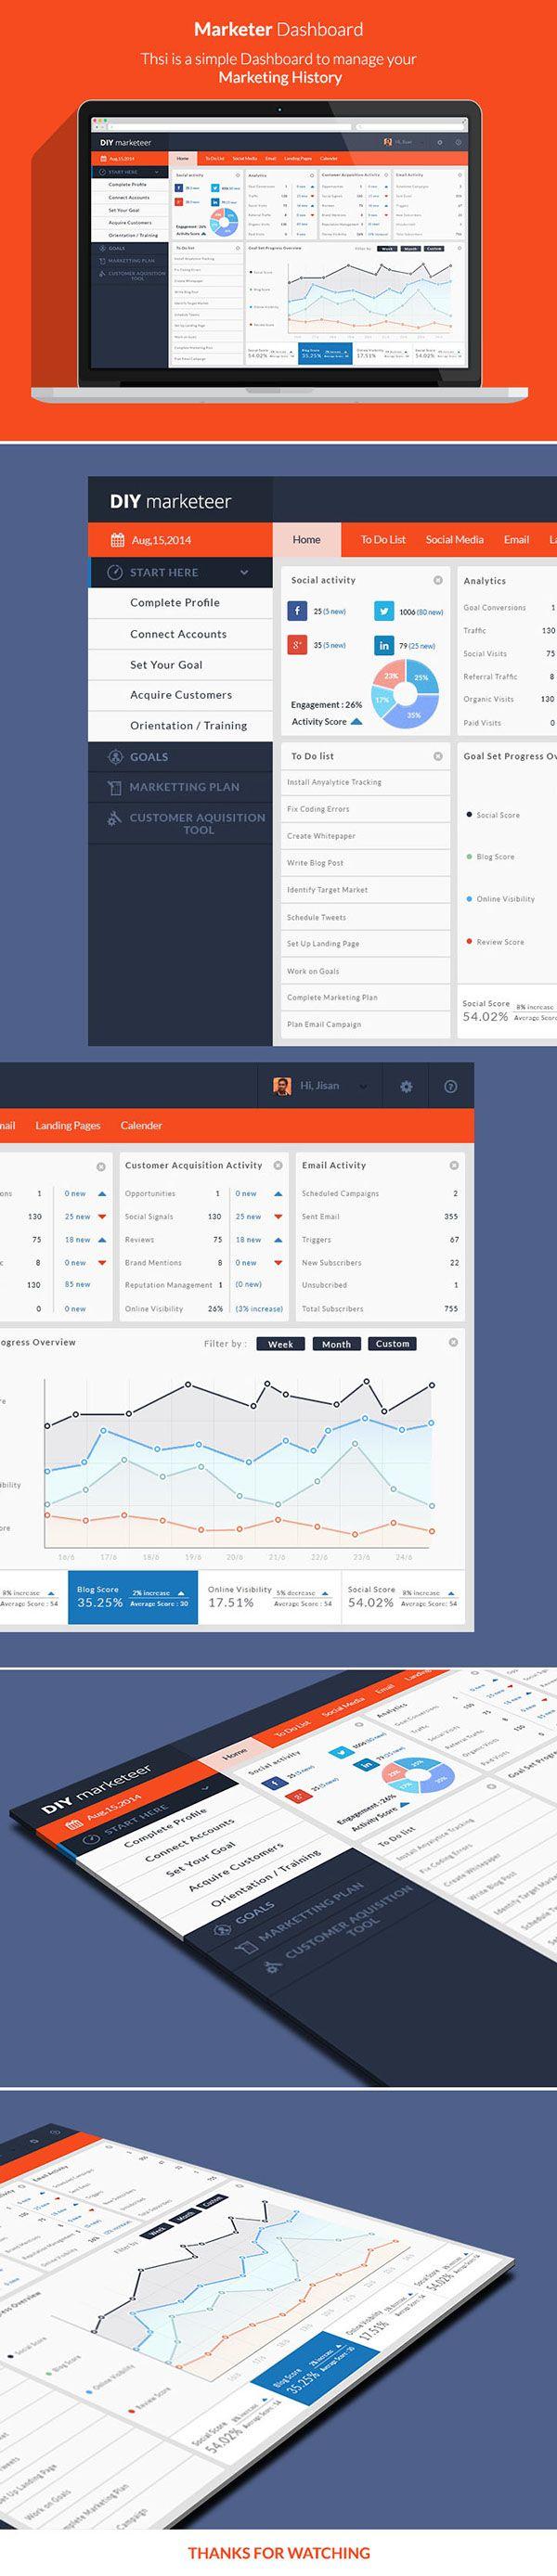 UI/UX - Marketer Dashboard  by MD Jahangir Alam Jisan, via Behance